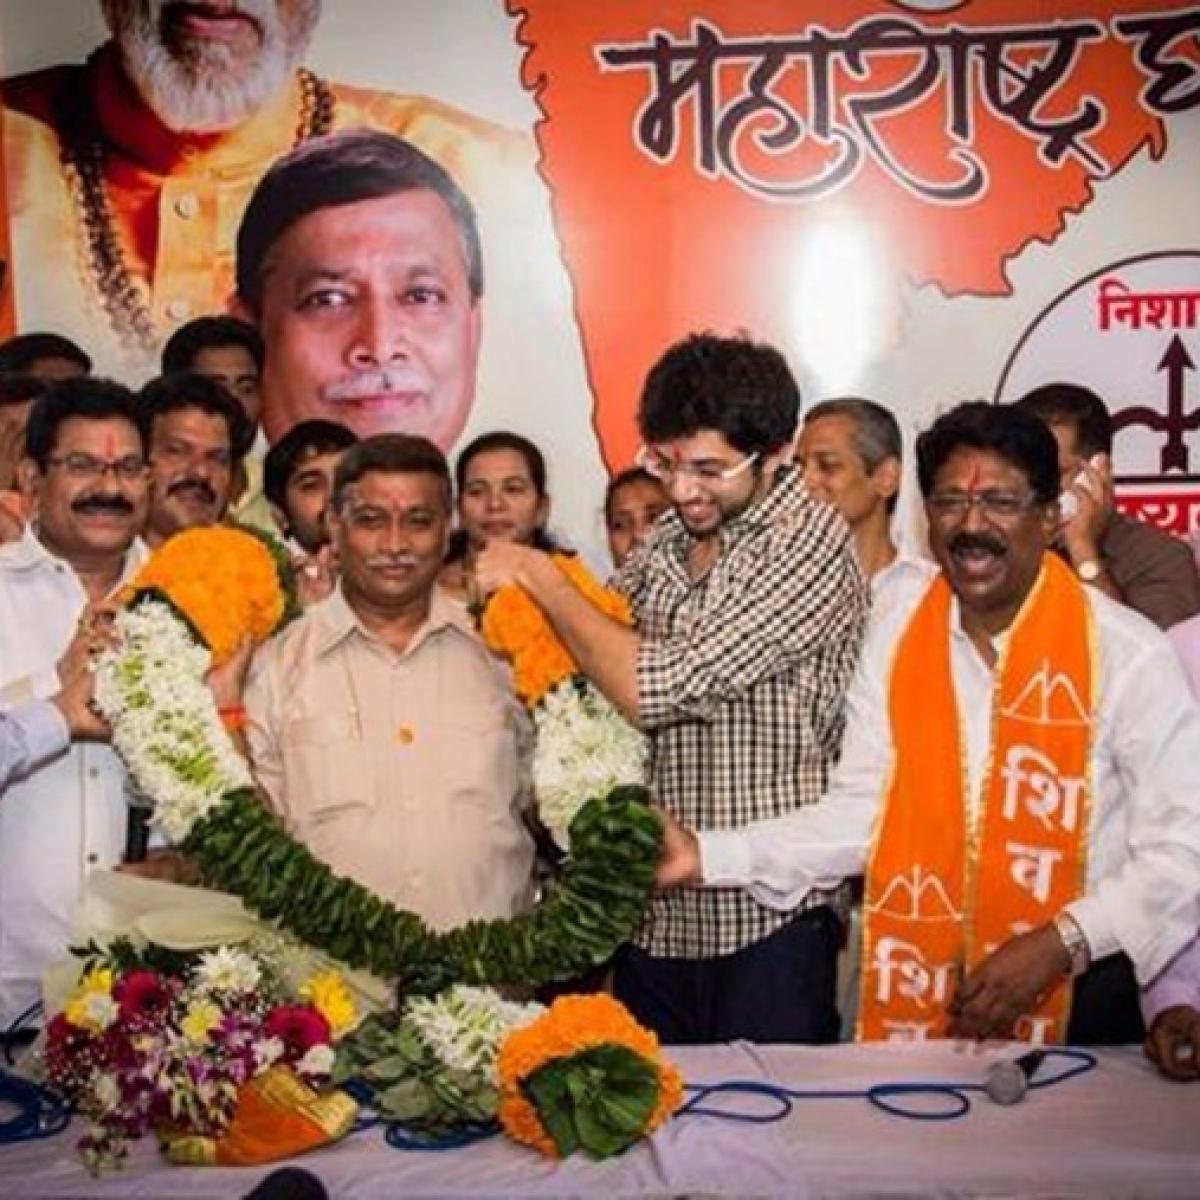 Maharashtra Election 2019 - Shivadi Assembly Constituency of Mumbai: Shiv Sena's Ajay Vinayak Choudhari wins